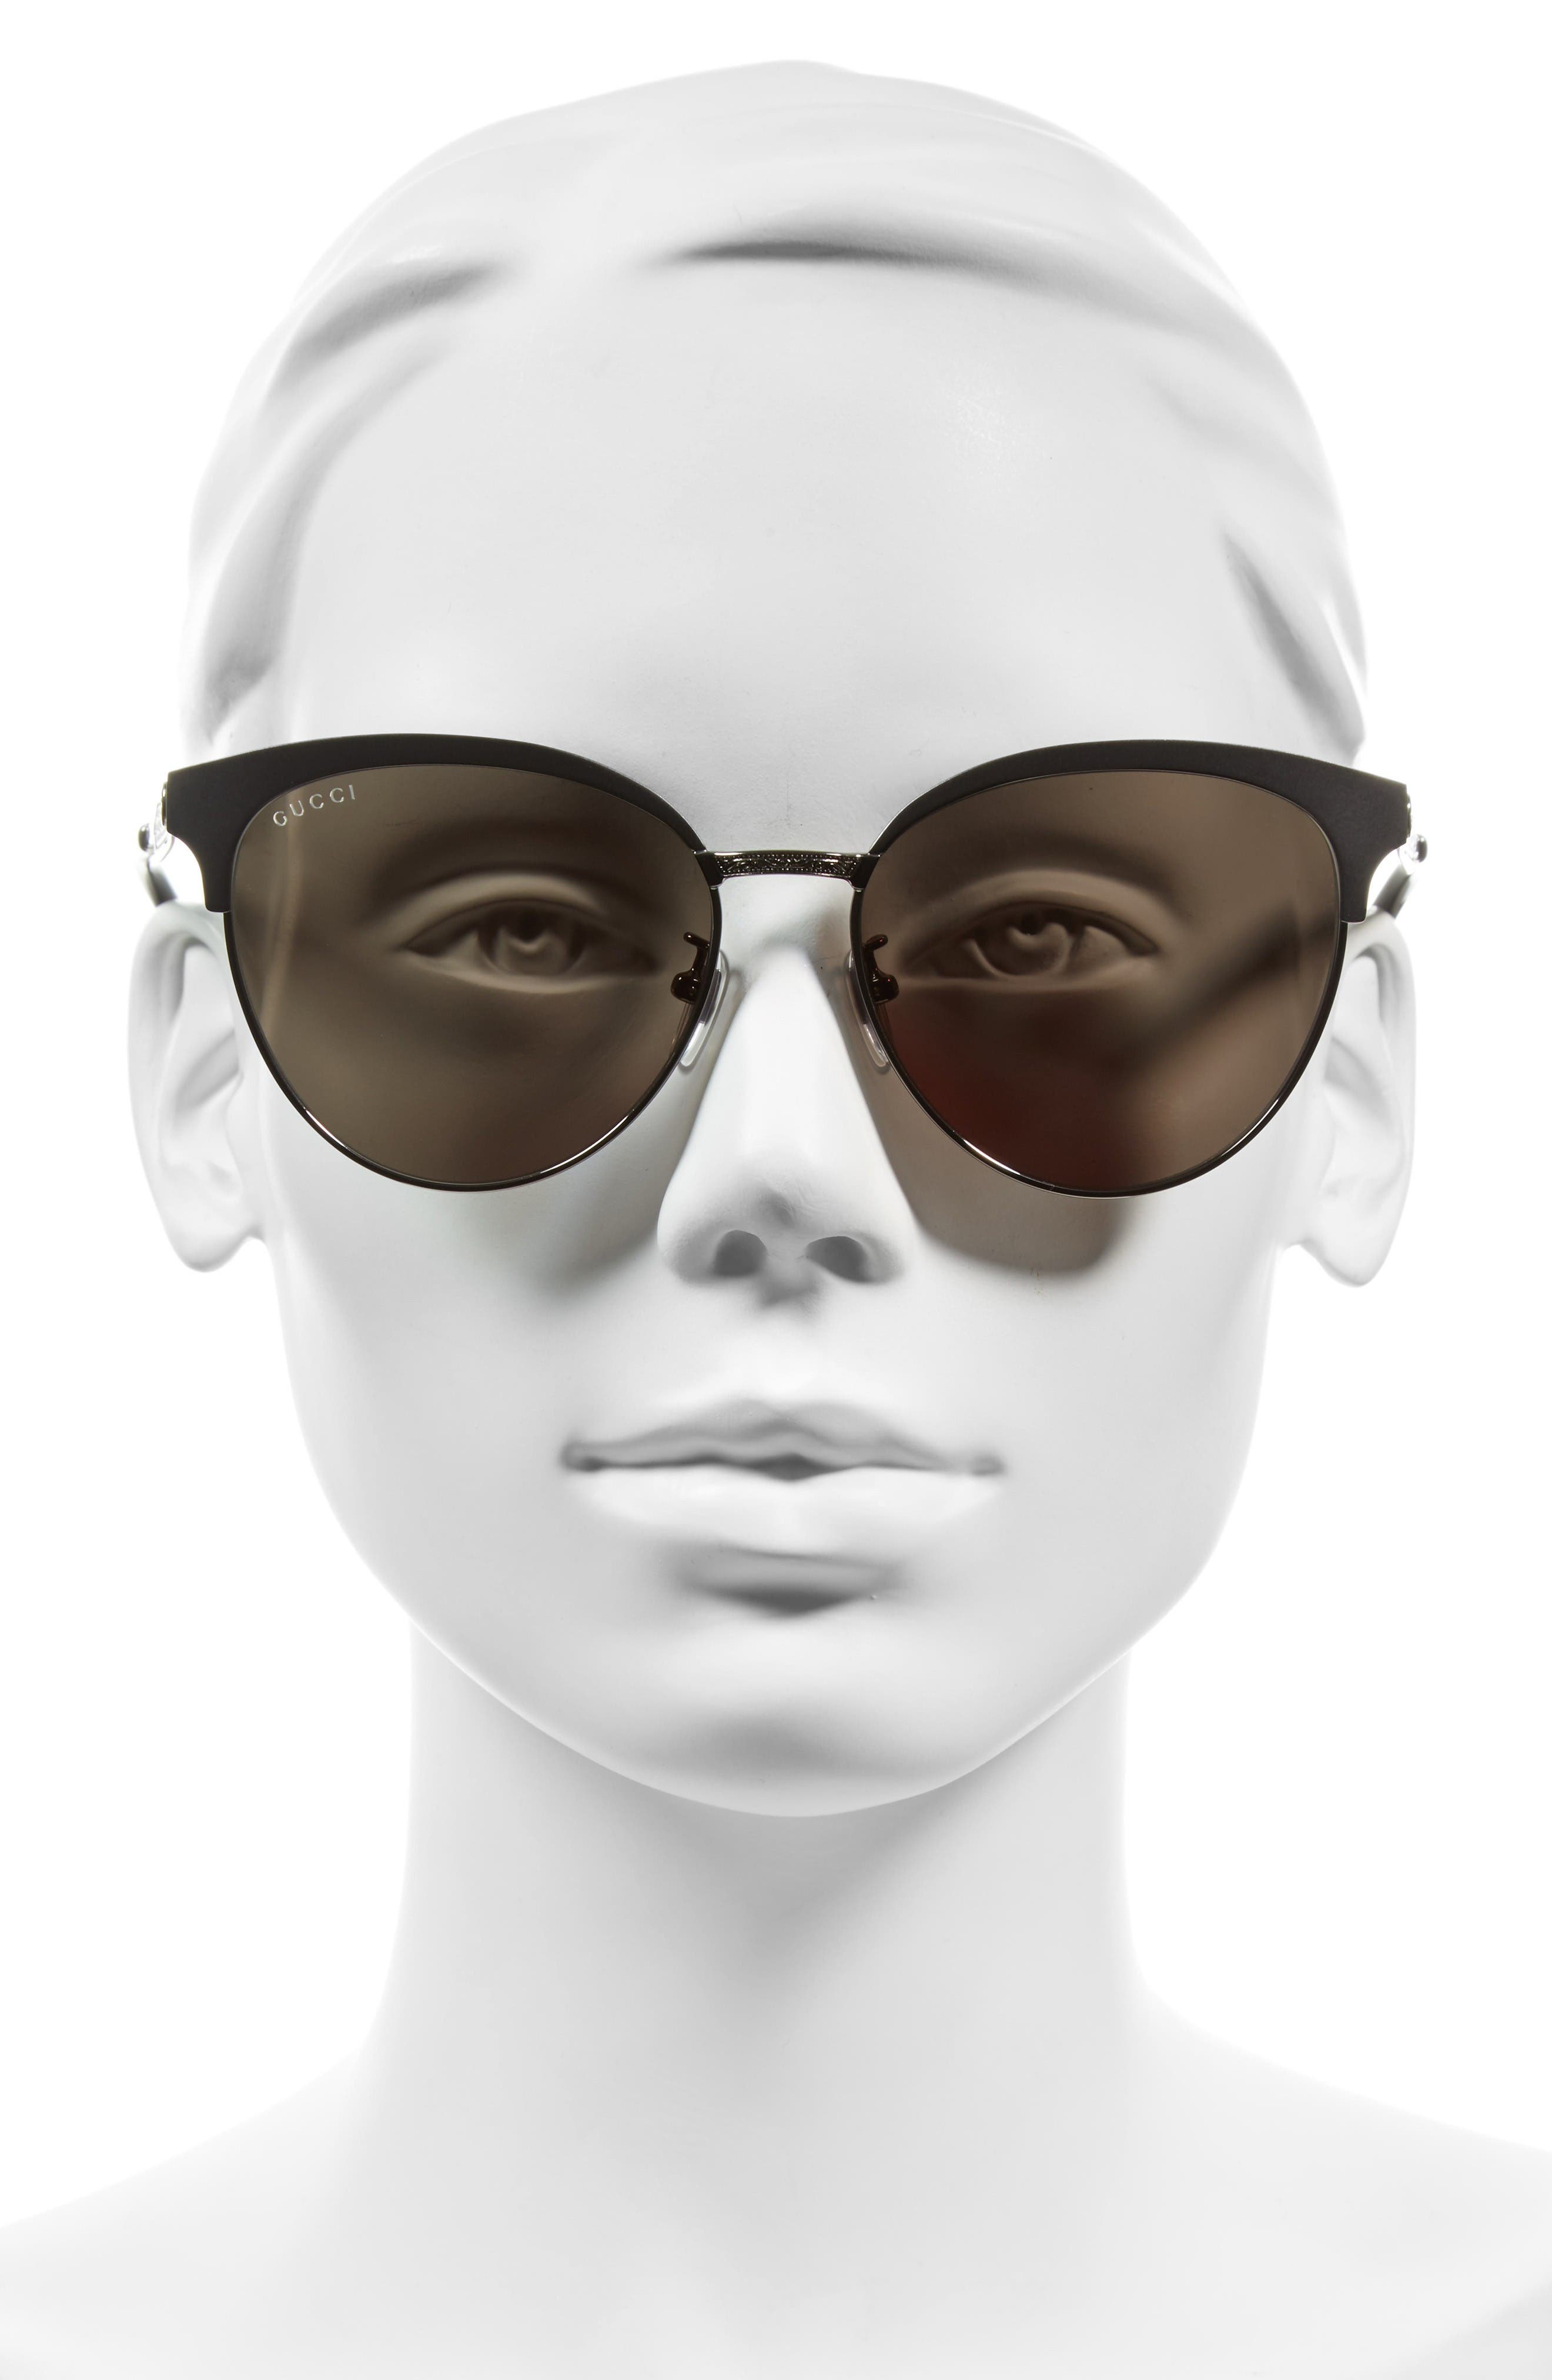 57mm Retro Sunglasses,                             Alternate thumbnail 2, color,                             Ruthenium/ Green